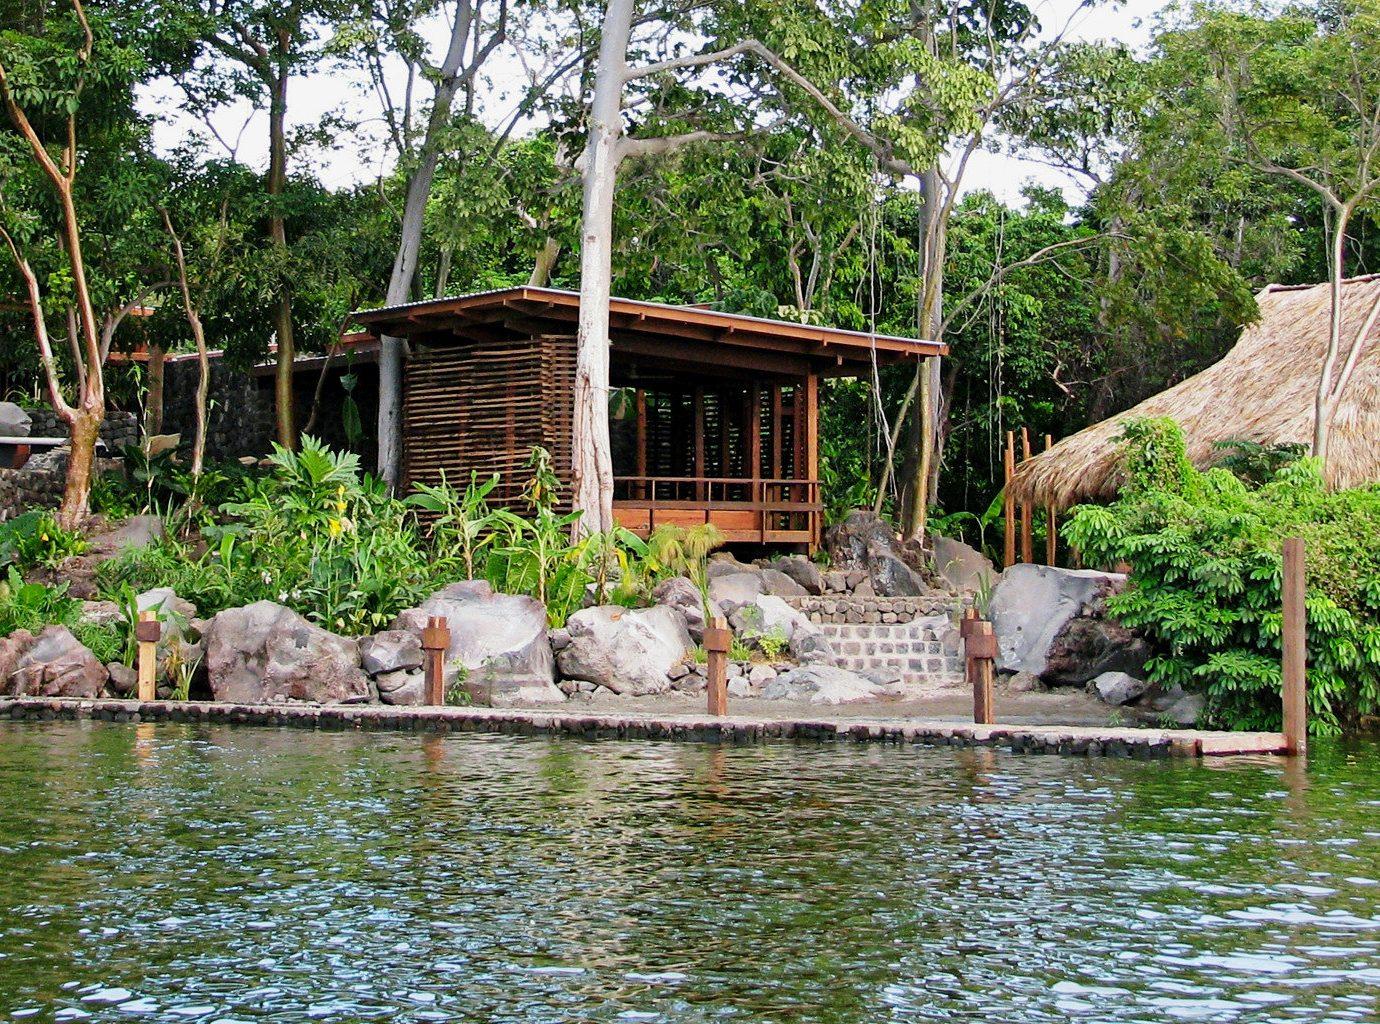 All-inclusive Beach Eco Resort Romantic Secret Getaways Trip Ideas Wellness tree outdoor Nature pond Jungle zoo Garden backyard swimming pool Village stone several